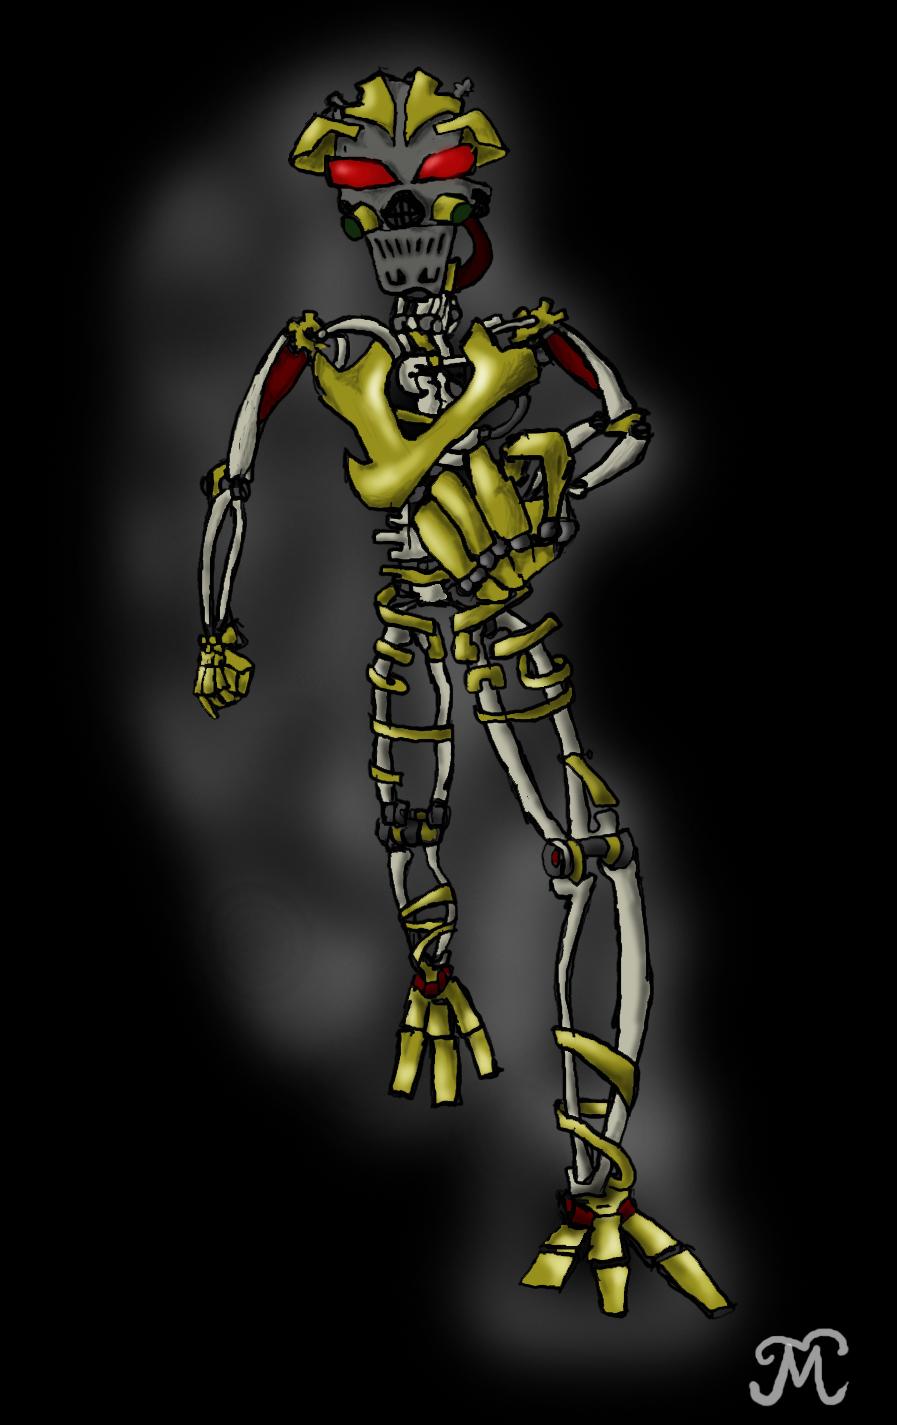 BoneBot